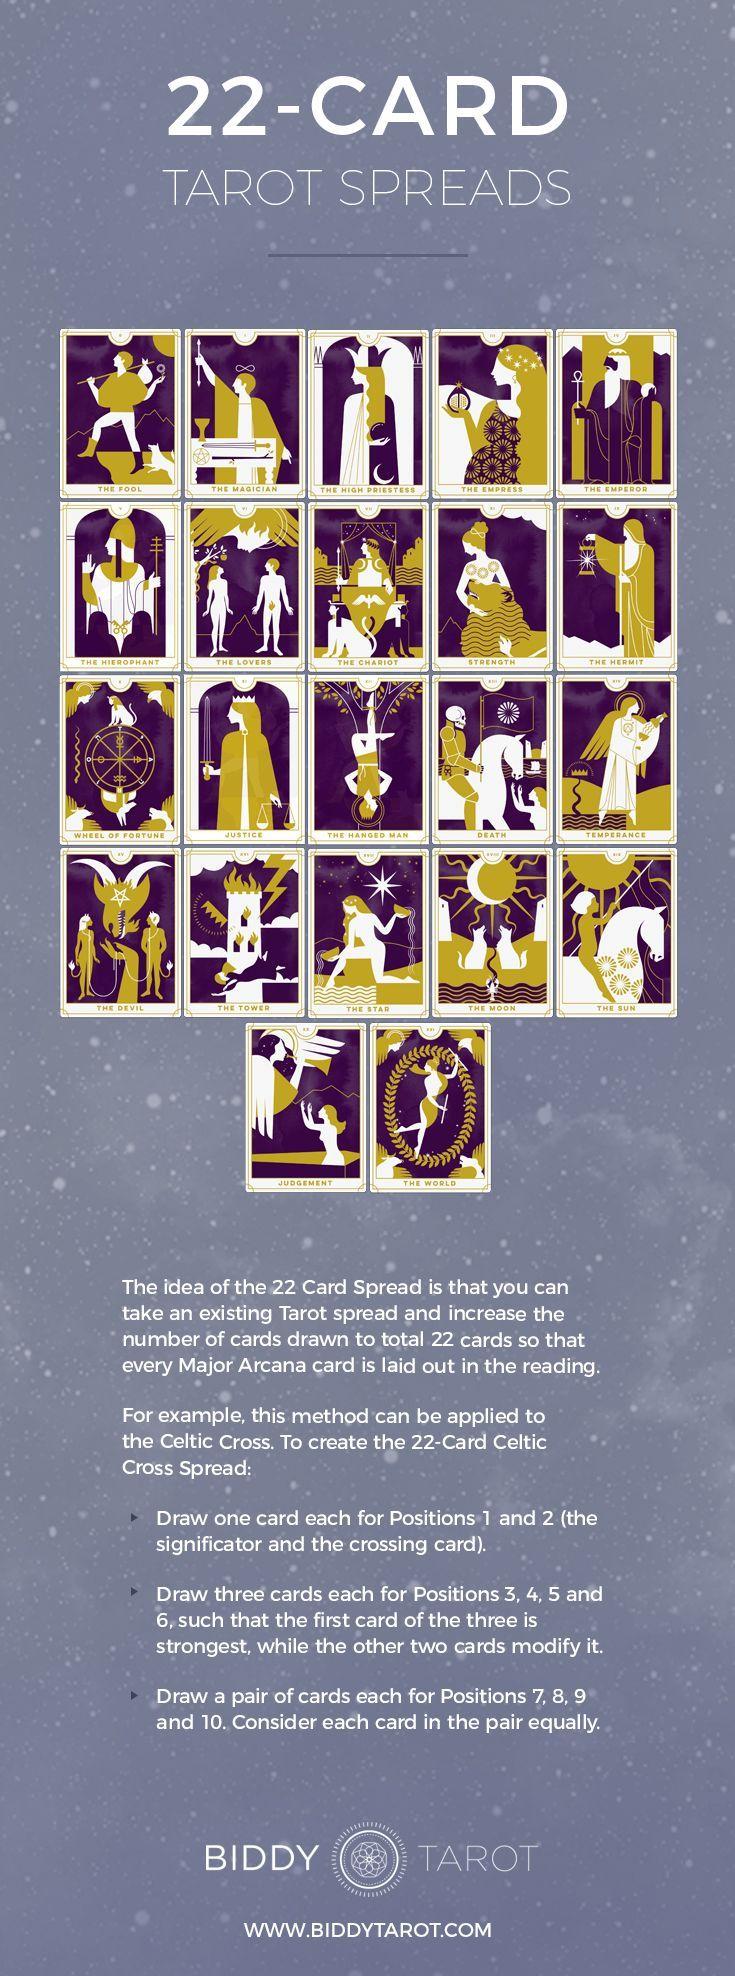 Major arcana tarot spreads tarot spreads tarot card